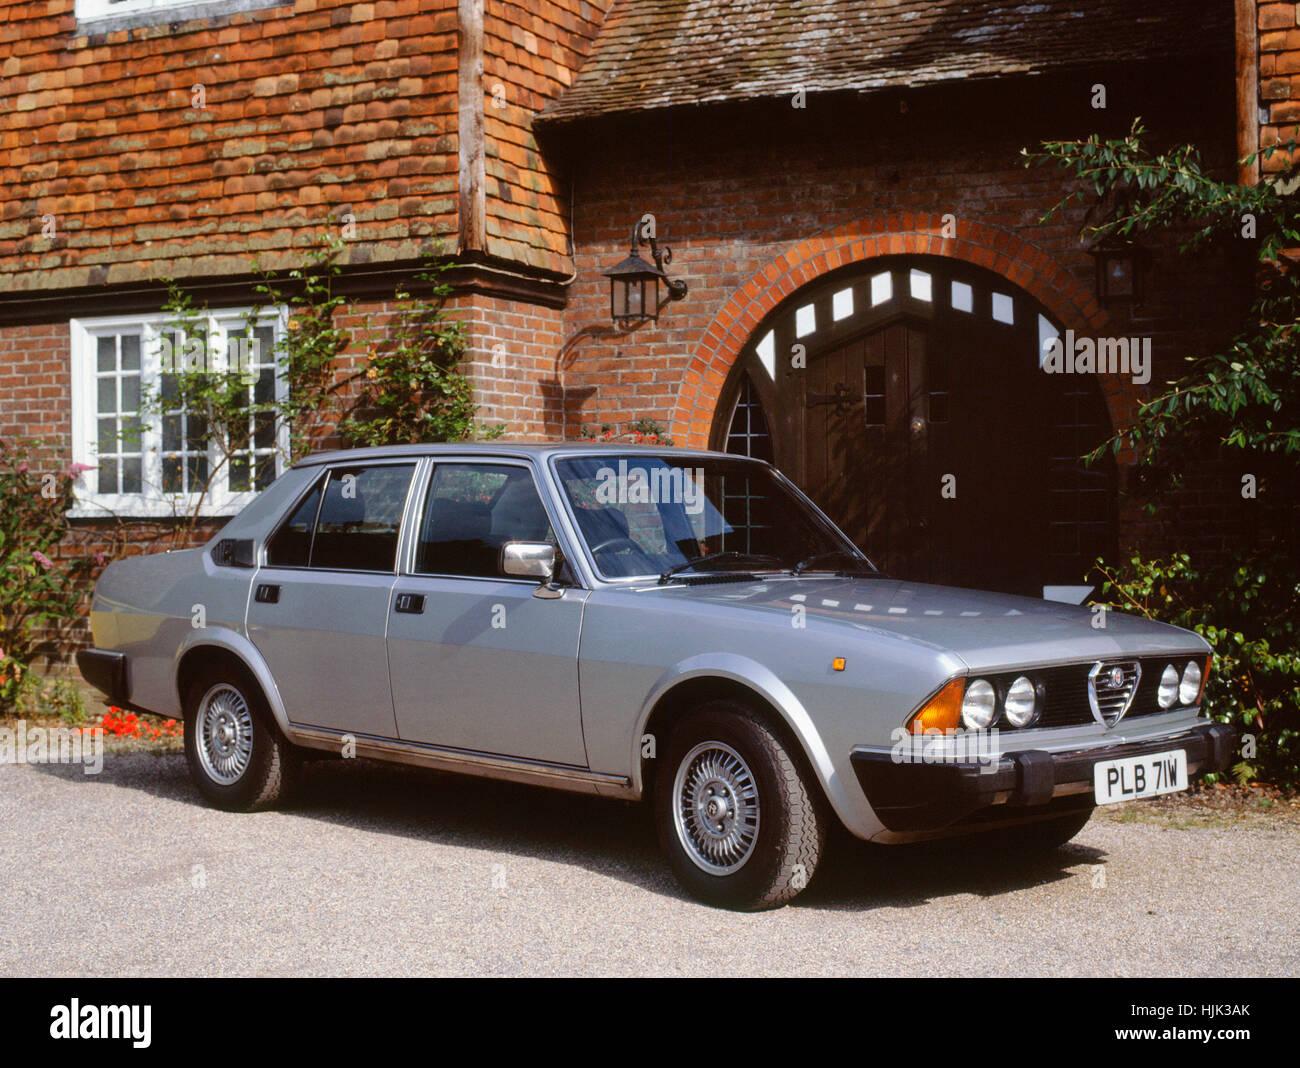 1981 Alfa Romeo 6 - Stock Image